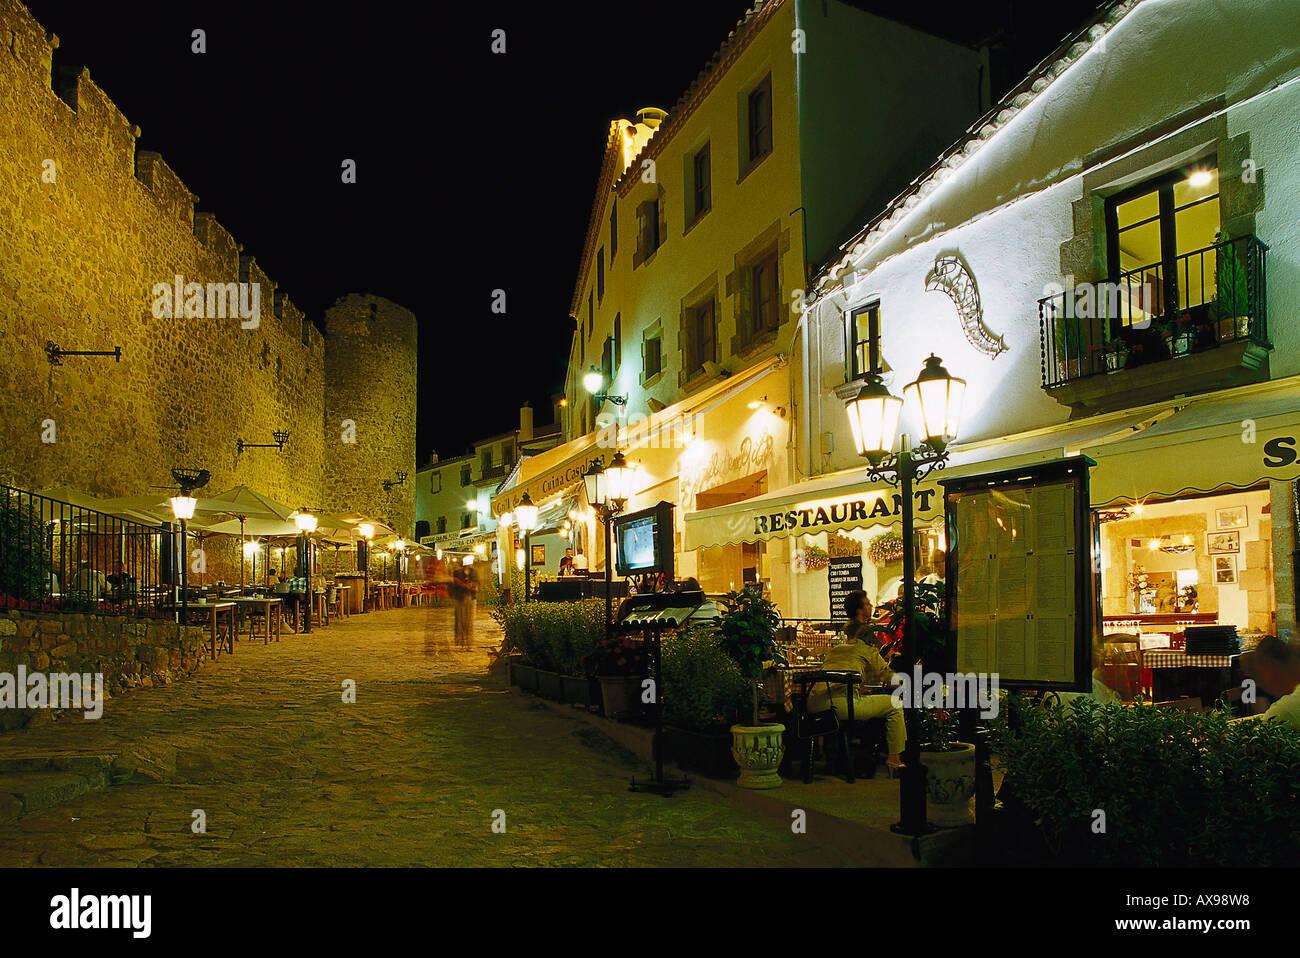 Restaurant Sa Muralla, medieval city wall, Tossa de Mar, Province of Girona, Costa Brava, Catalonia, Spain - Stock Image